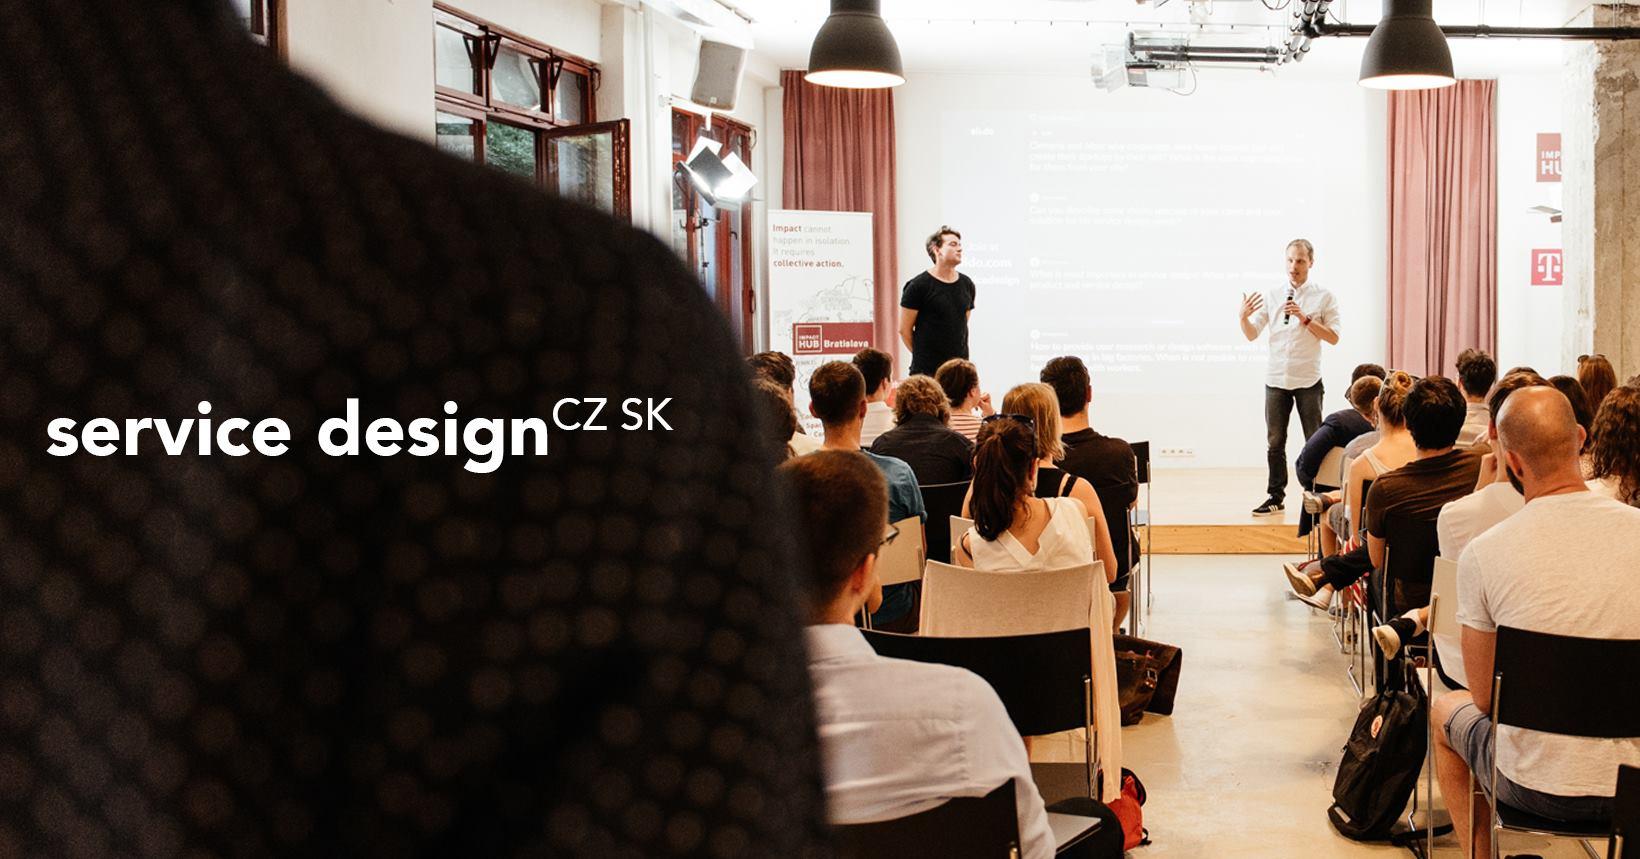 service design czsk